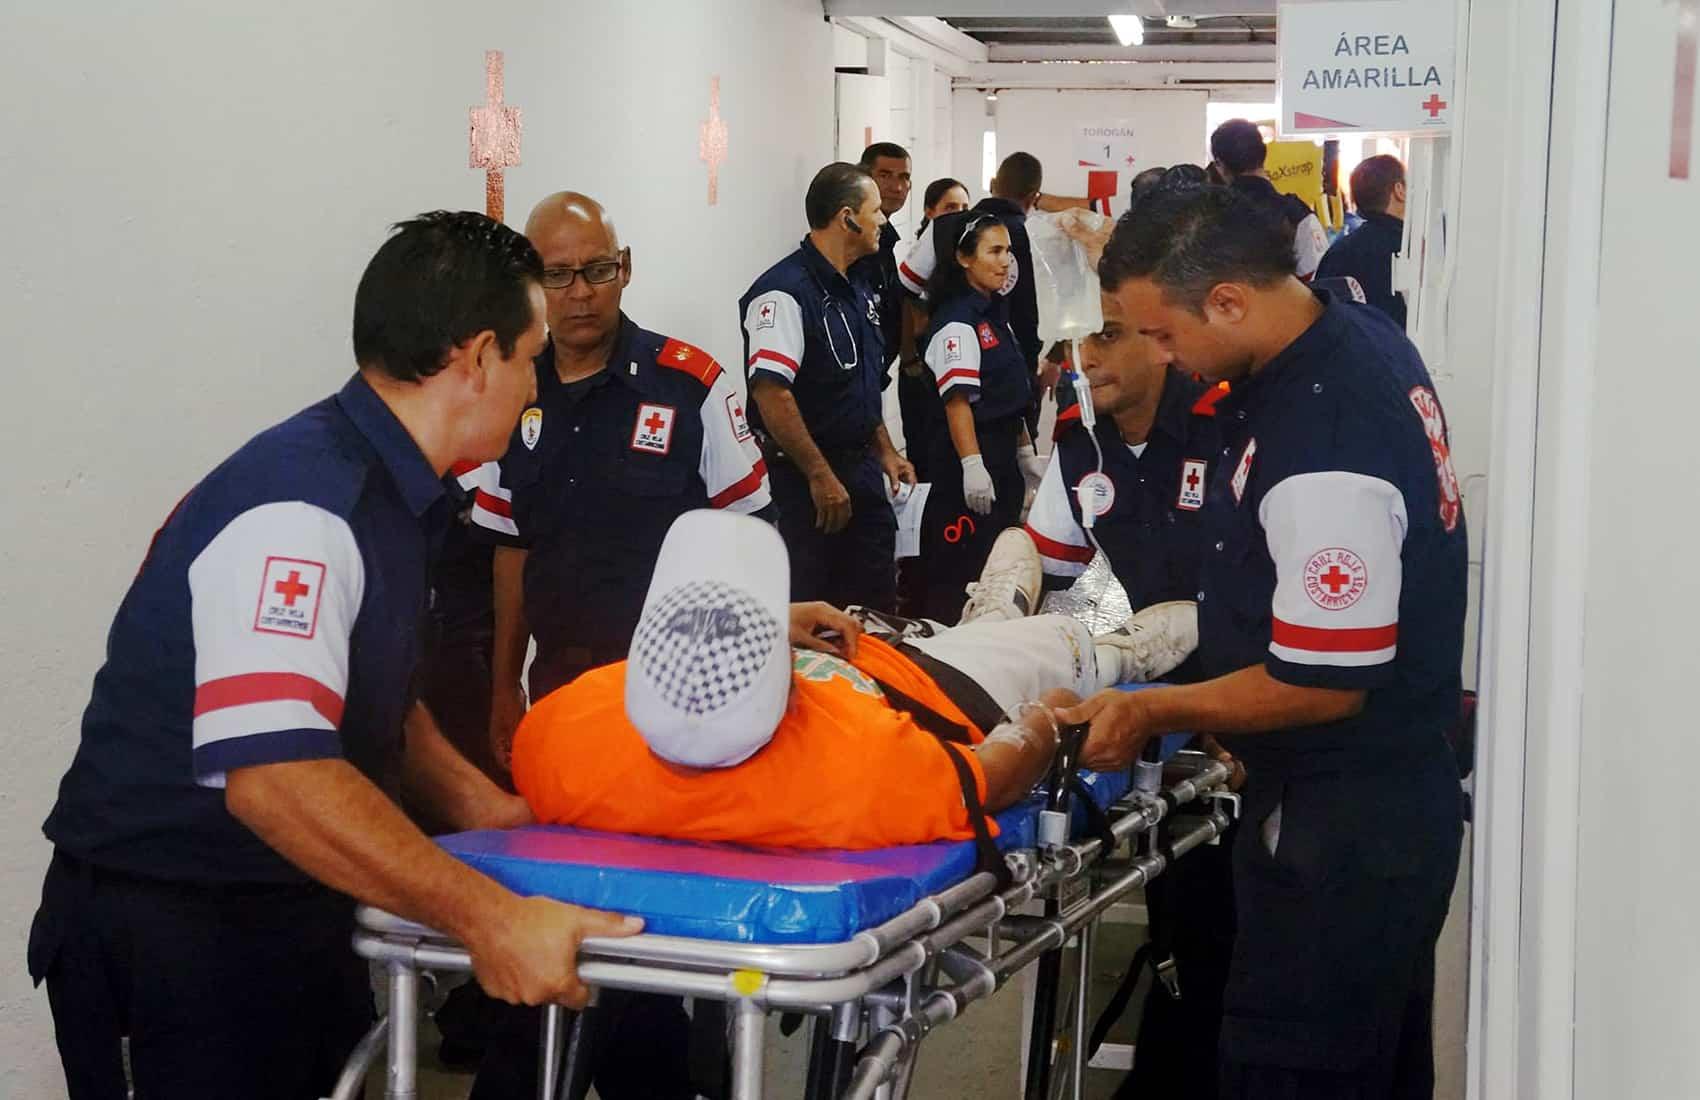 Red Cross staff